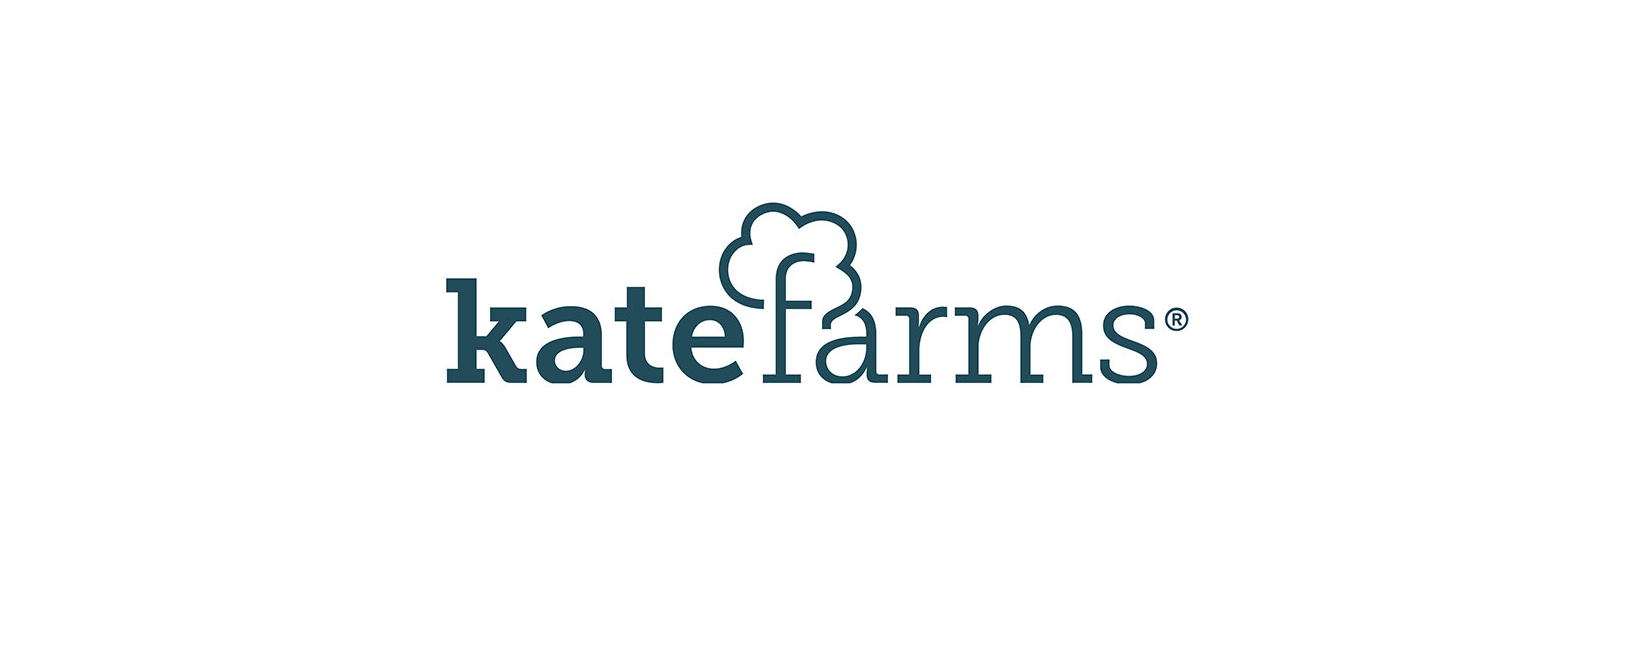 Kate Farms Discount Code 2021